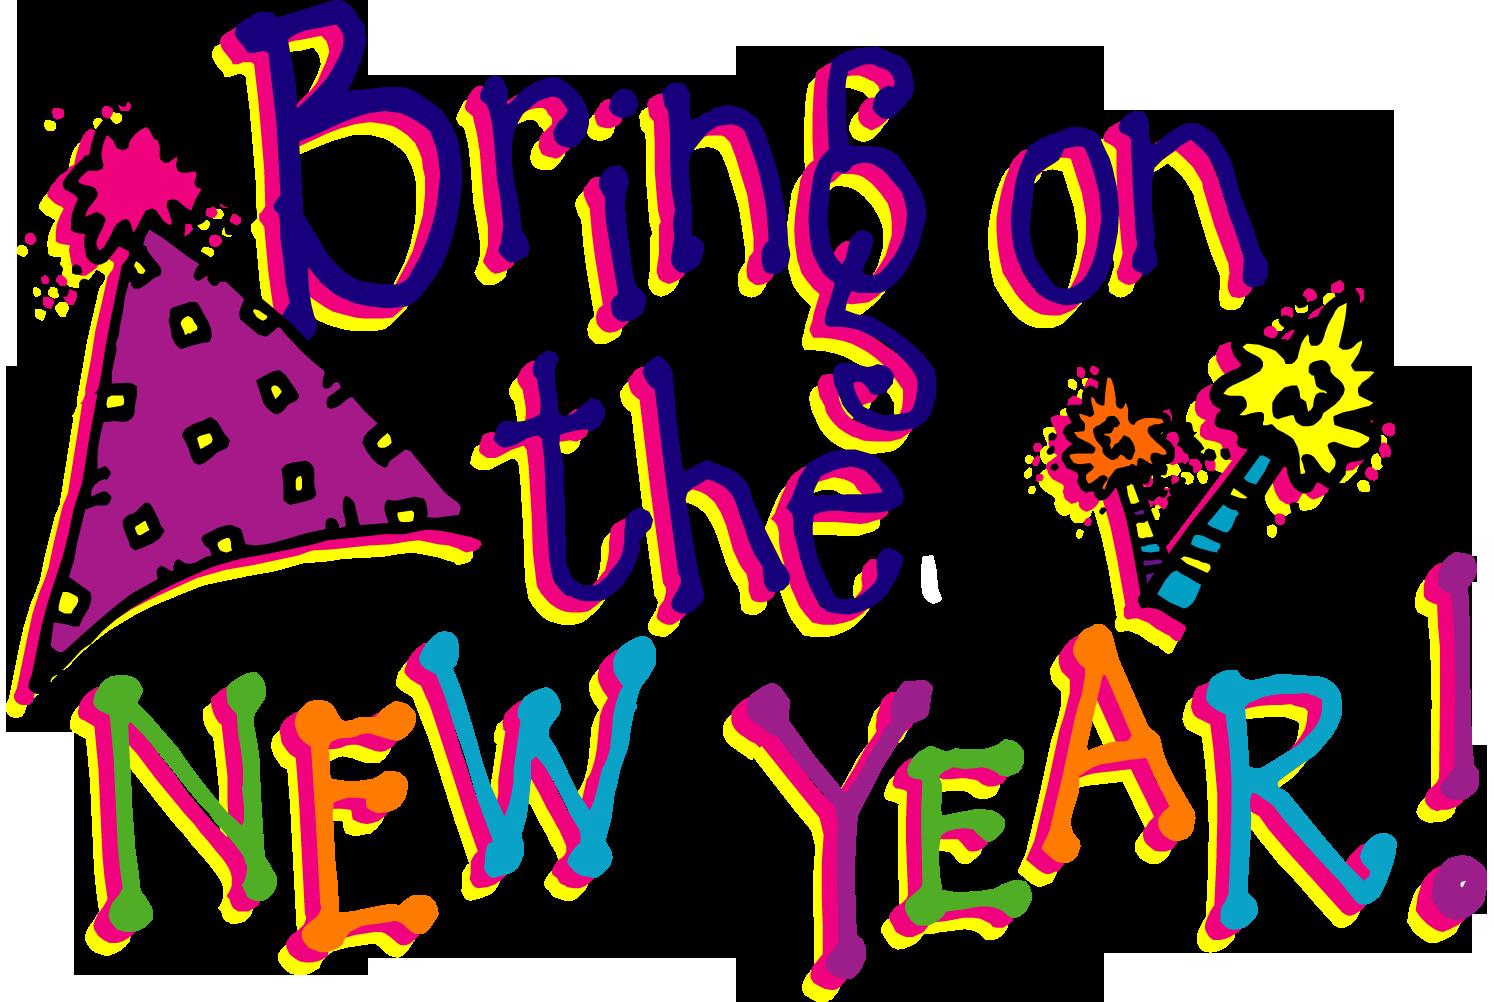 Happy new year clipart 6 .-Happy new year clipart 6 .-12